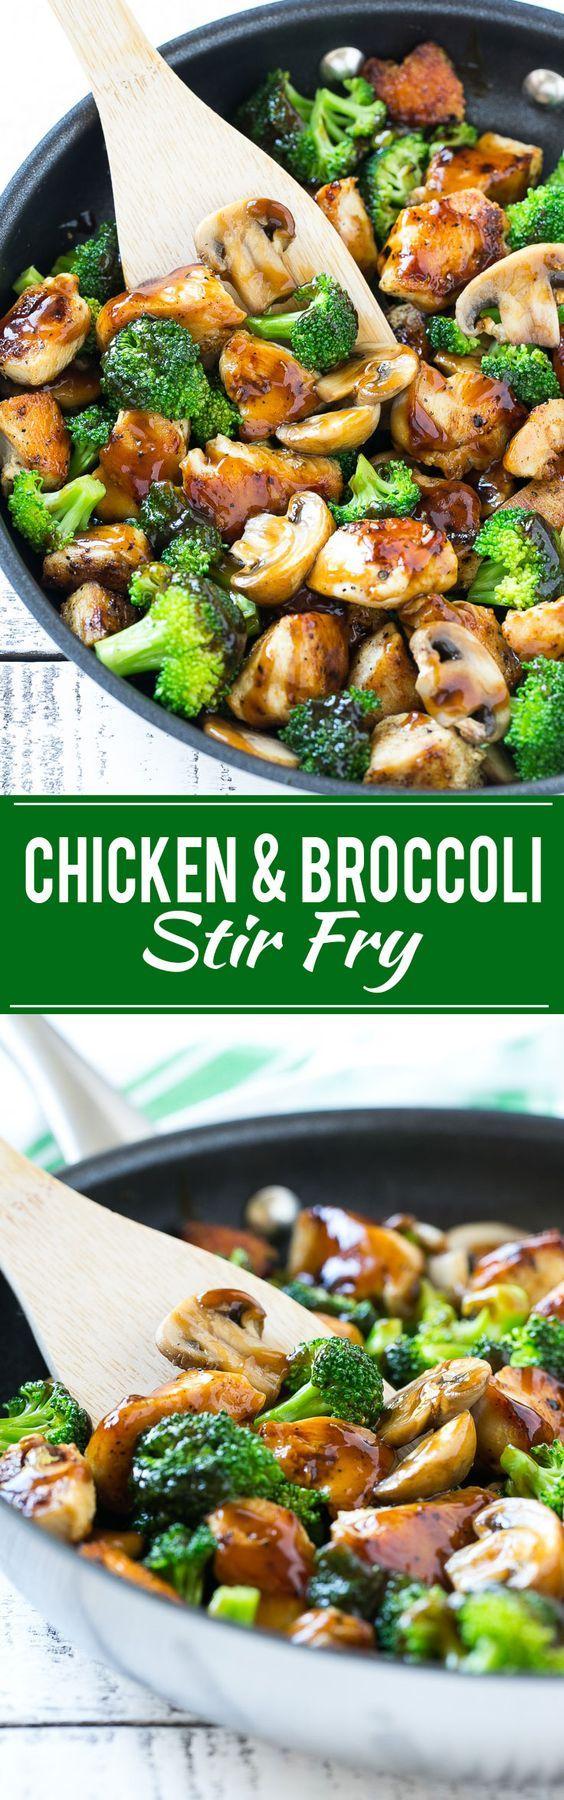 and Broccoli Stir Fry | Recipe | Broccoli Stir Fry, Broccoli Florets ...